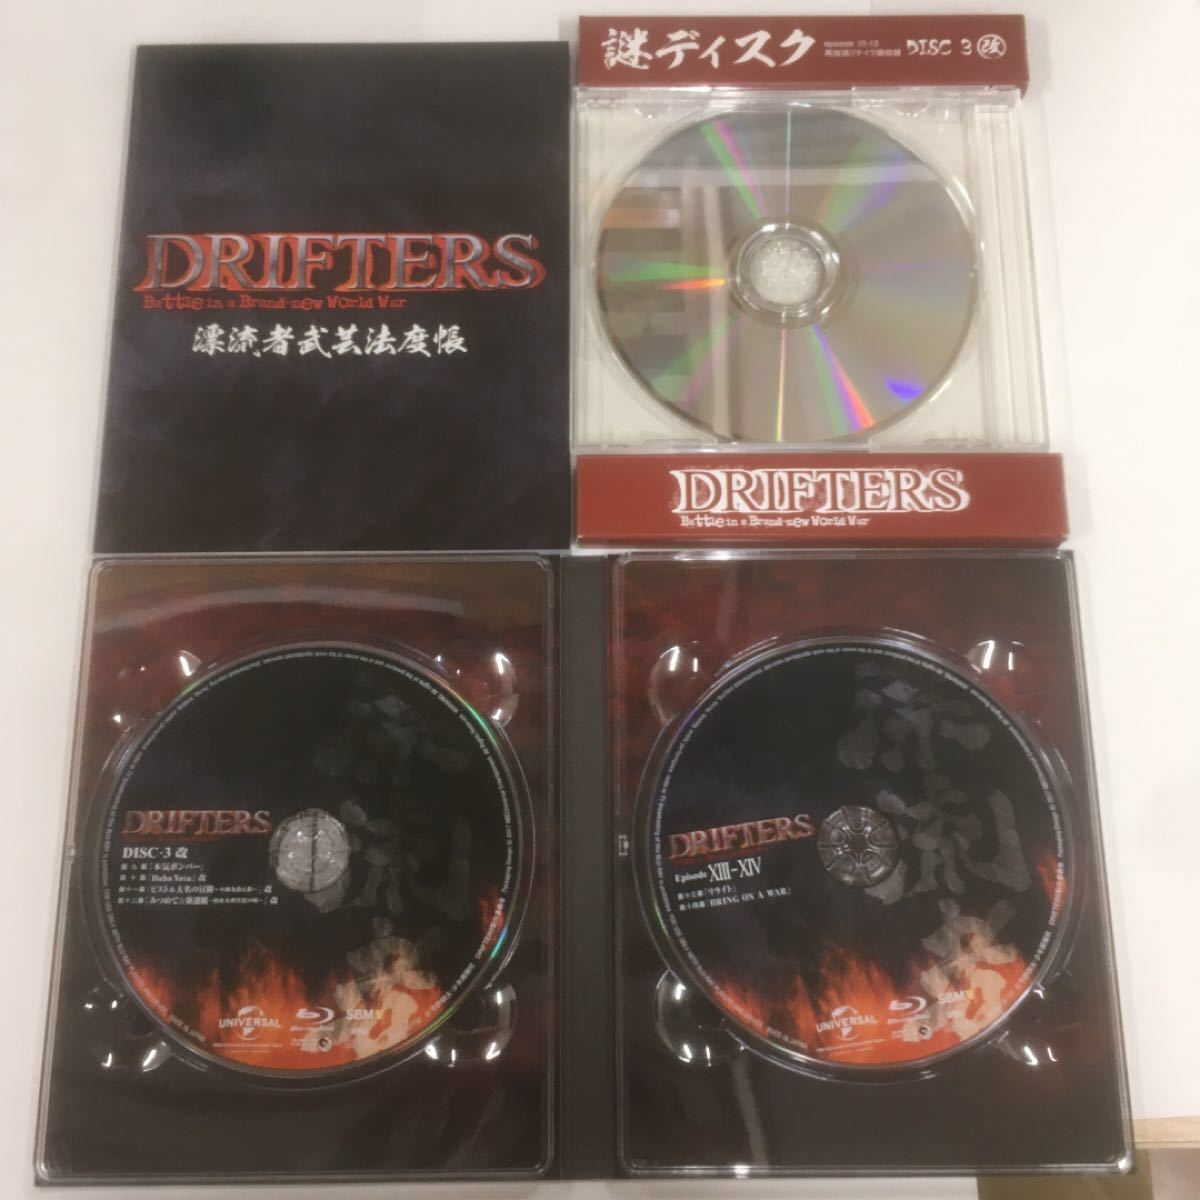 BD DRIFTERS episode 13-14 特装限定生産版 (Blu-ray Disc) [NBC]